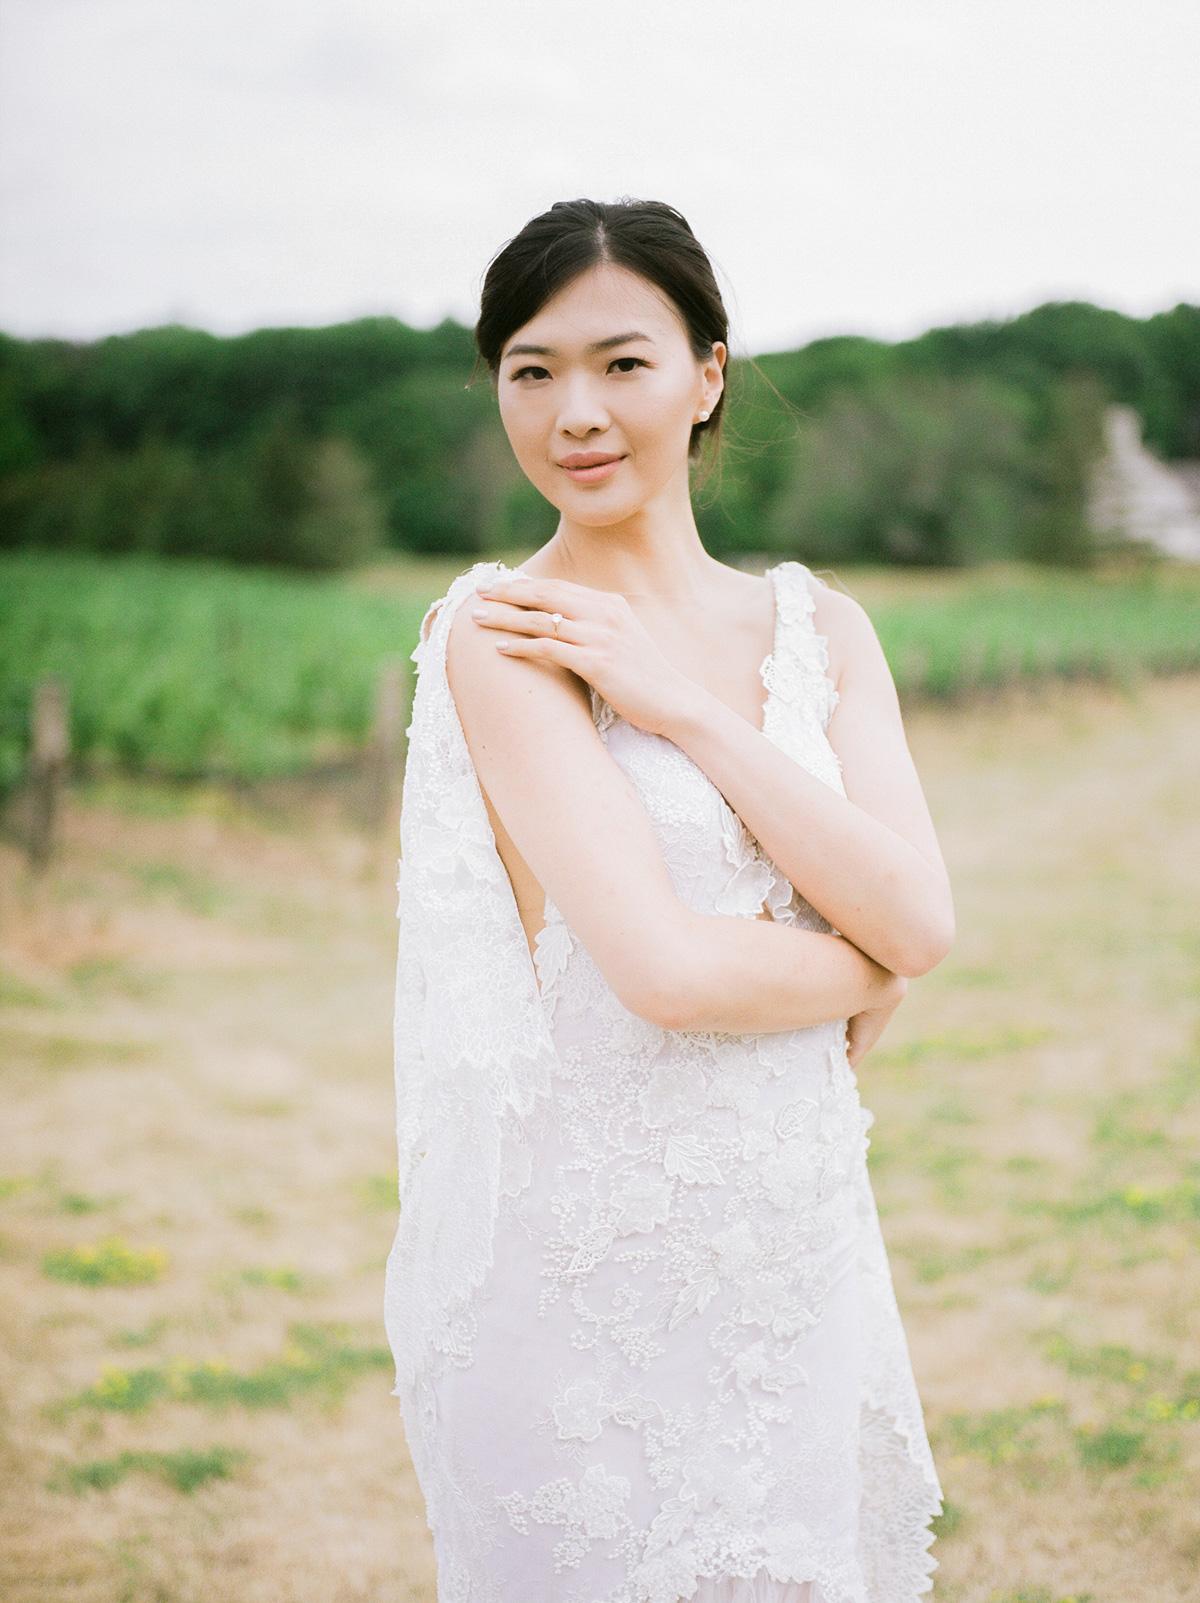 jennifer-xu-photography-vineyard-bride-swish-list-rosewod-eatstes-winery-beamsville-wedding-editorial-4.jpg